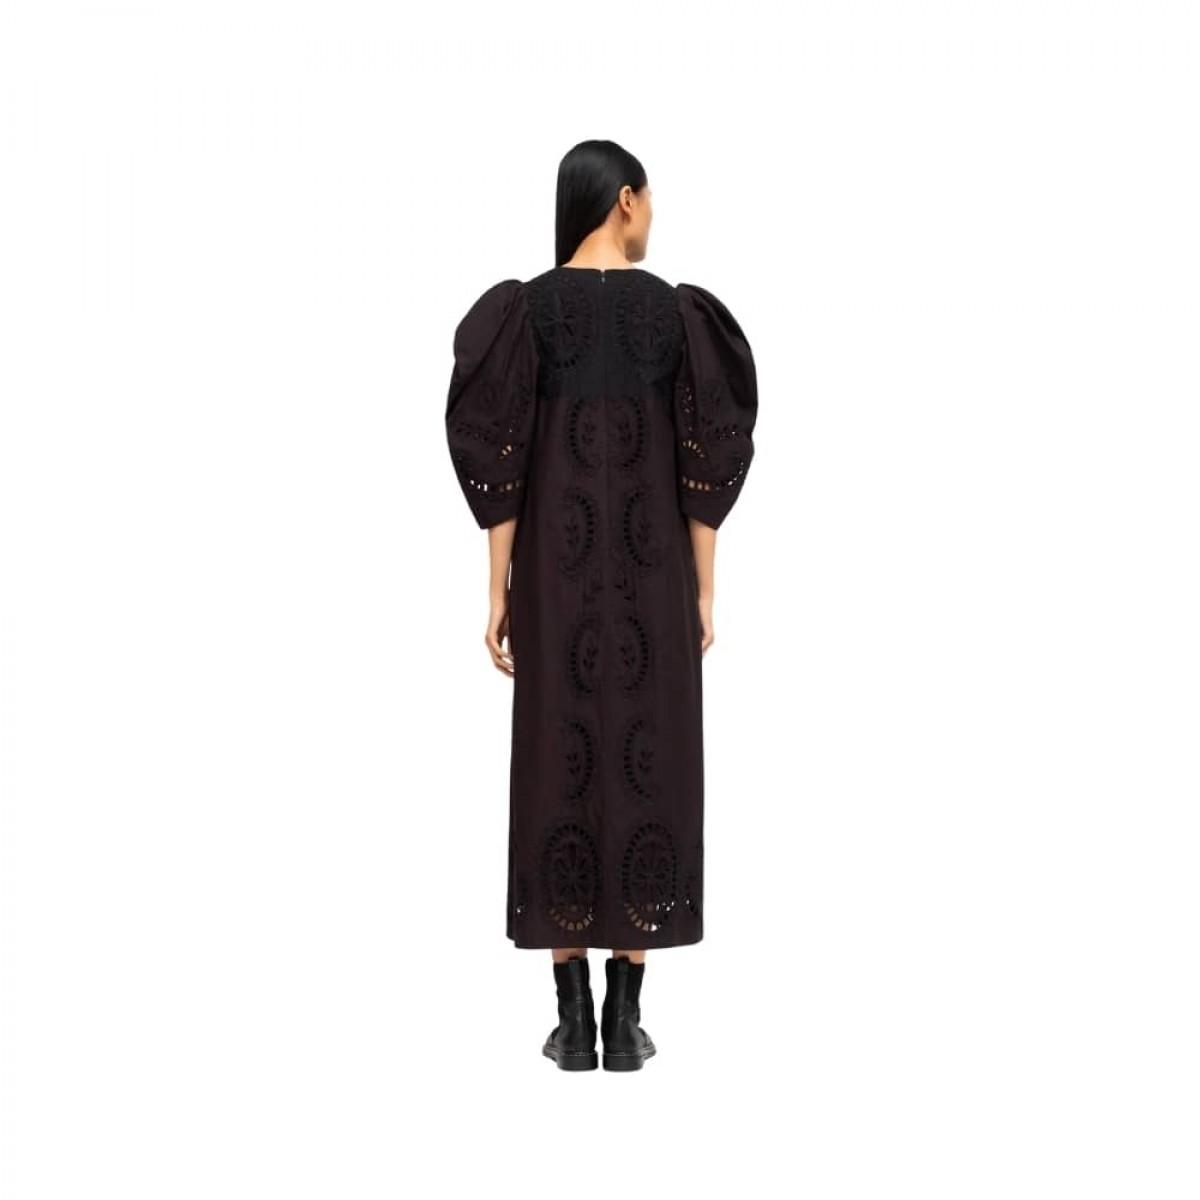 santos eyelet dress - black - model ryg